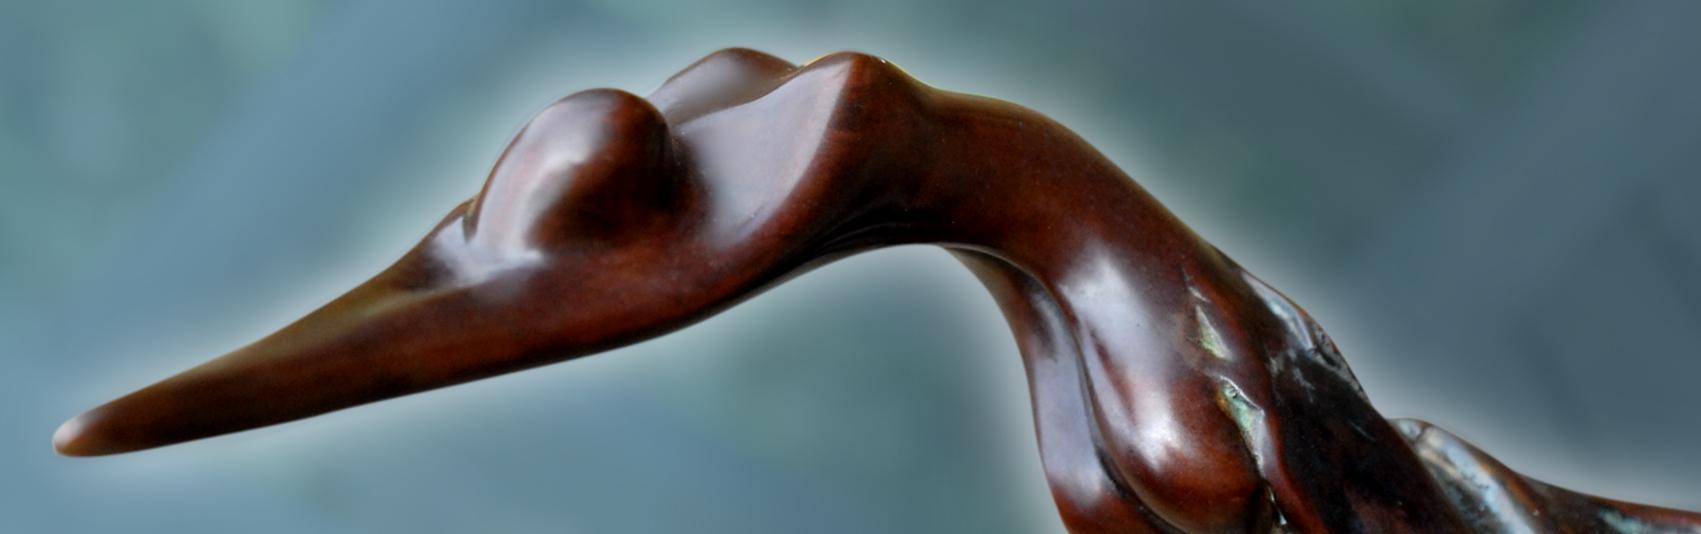 0016-bronze